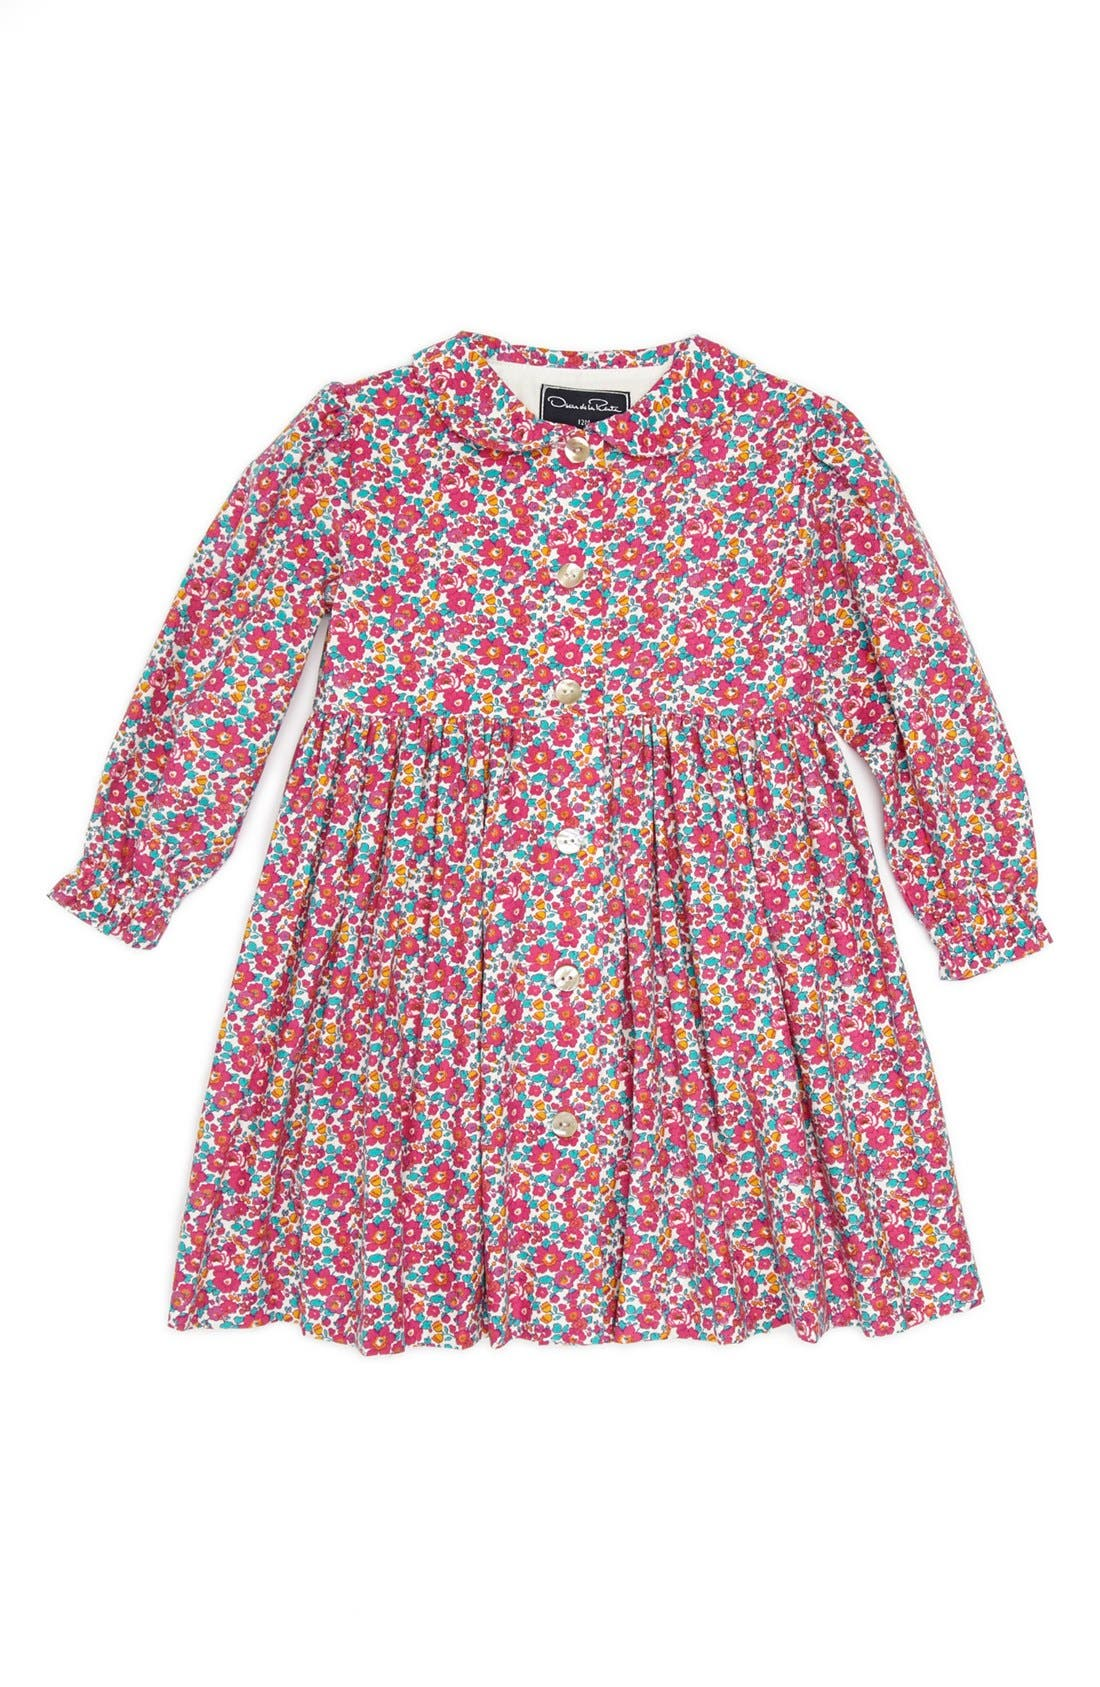 Alternate Image 1 Selected - Oscar de la Renta Print Dress (Baby Girls)